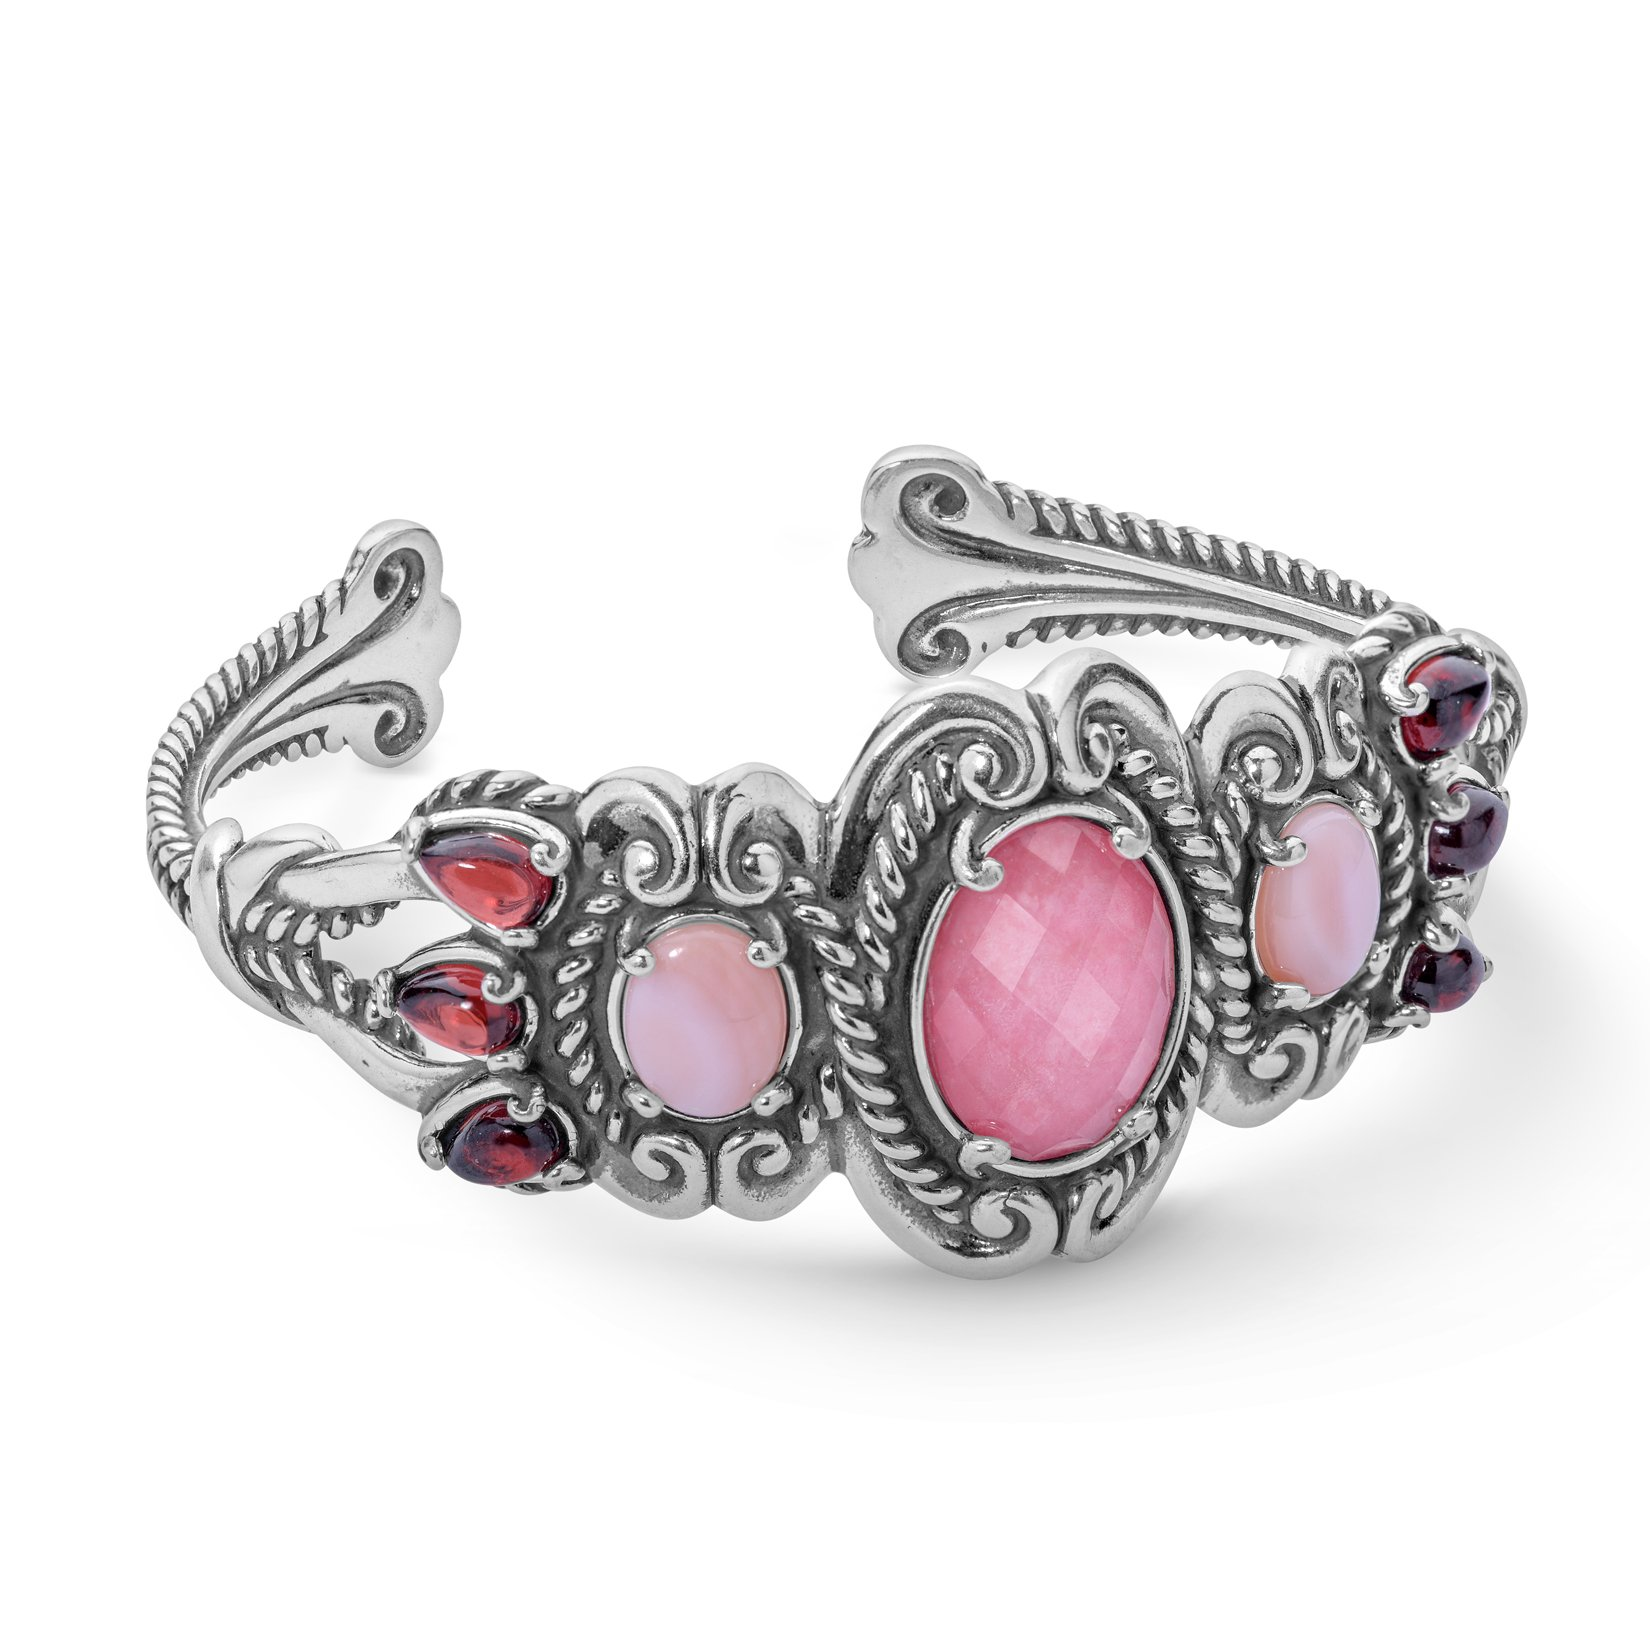 Tassels Sterling Silver & Shades of Pink Gemstones Cuff Bracelet